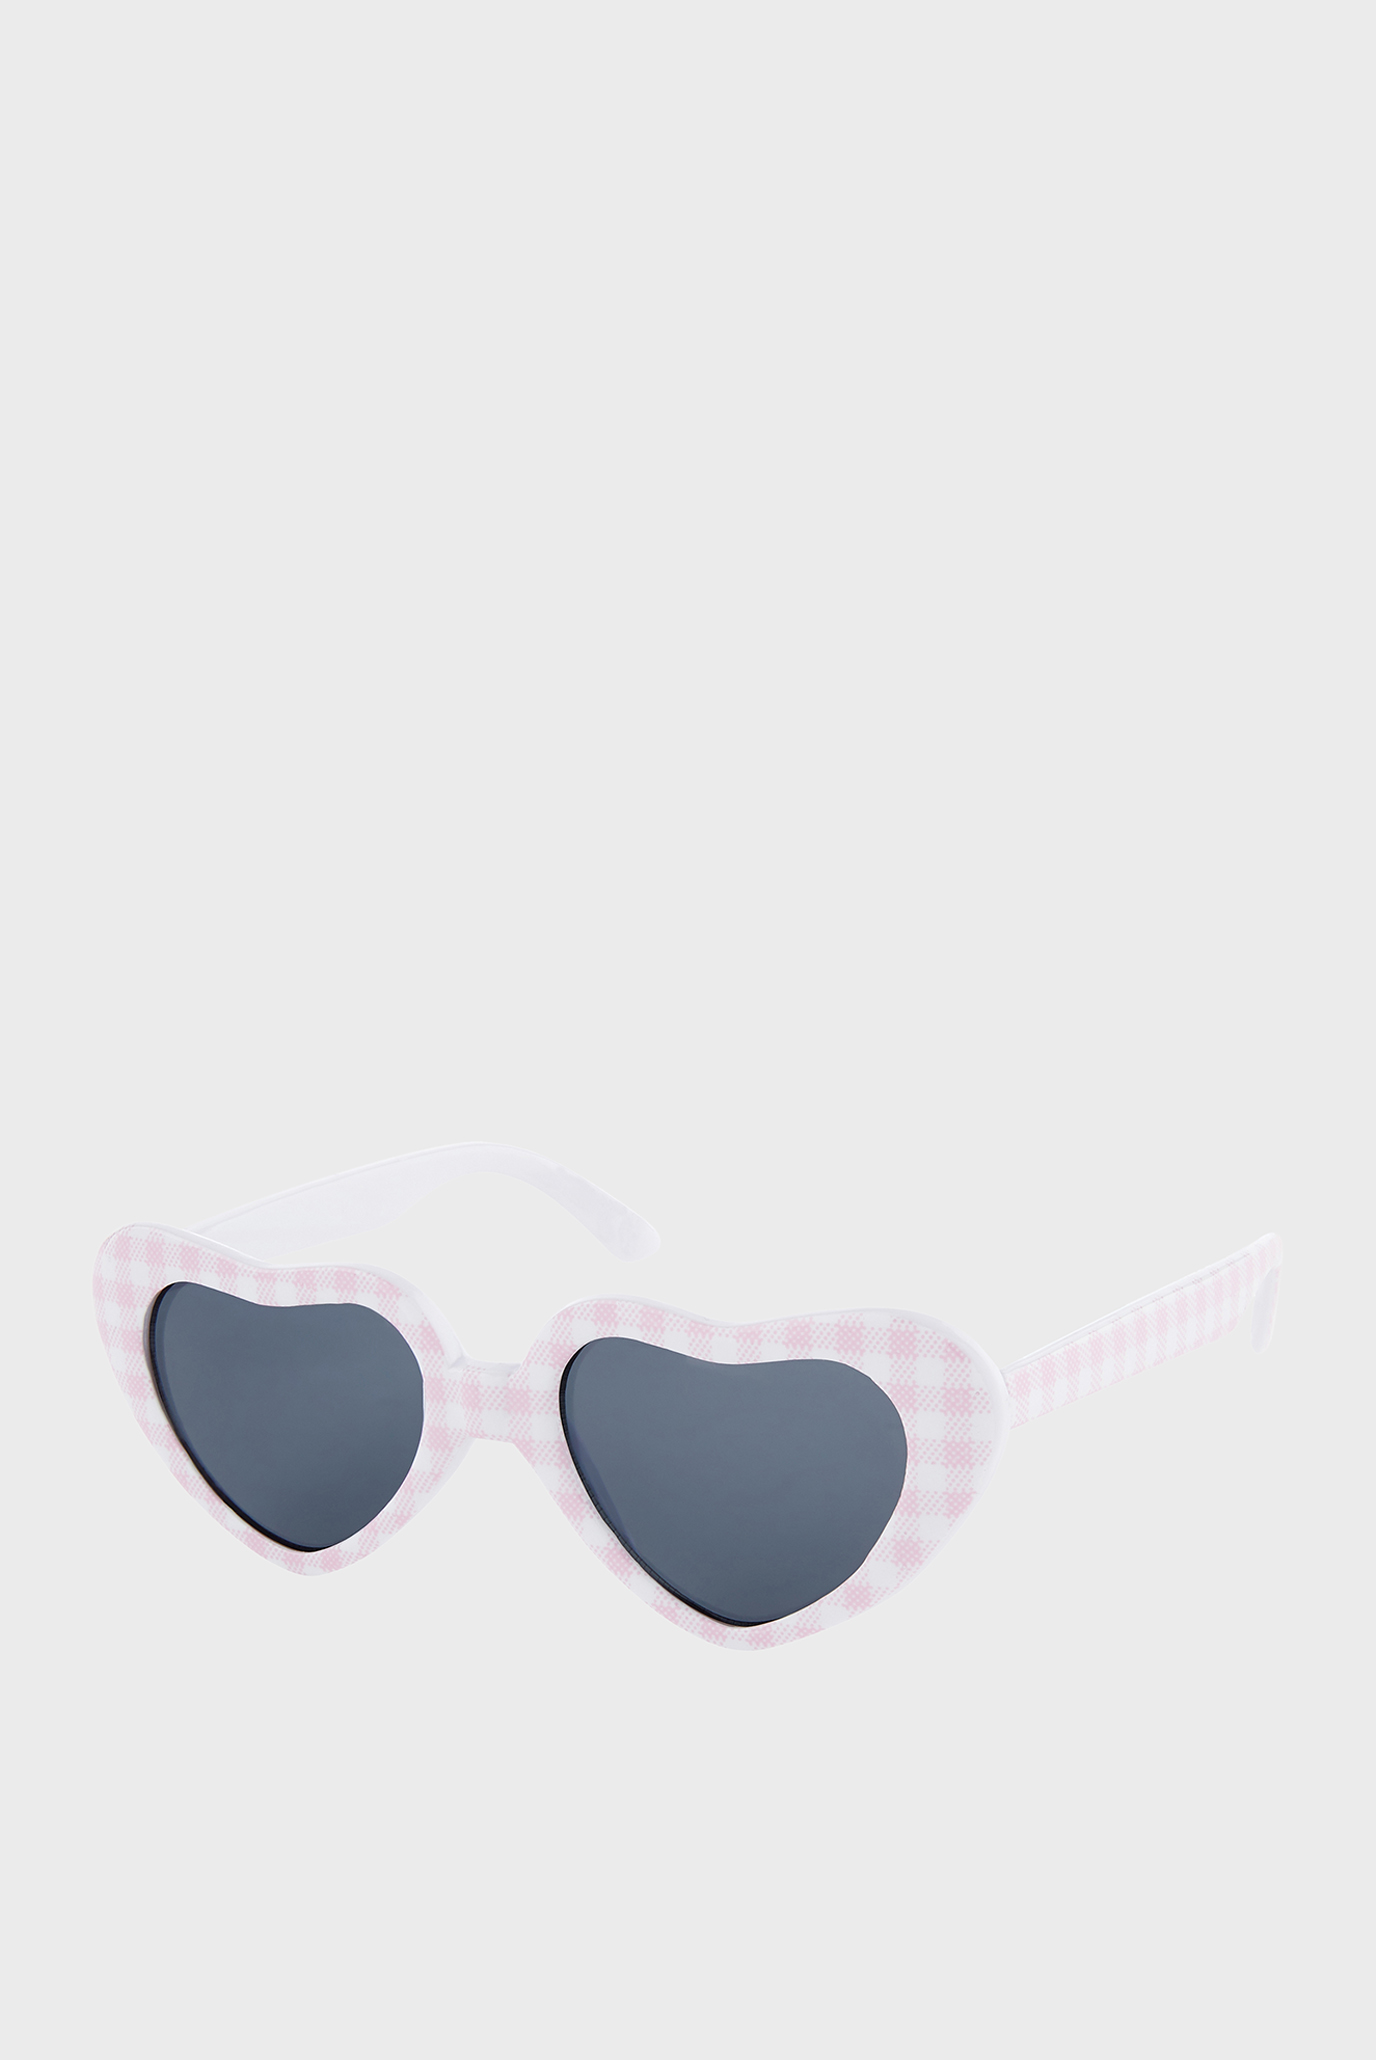 Дитячі білі окуляри BABY PINK GING 1